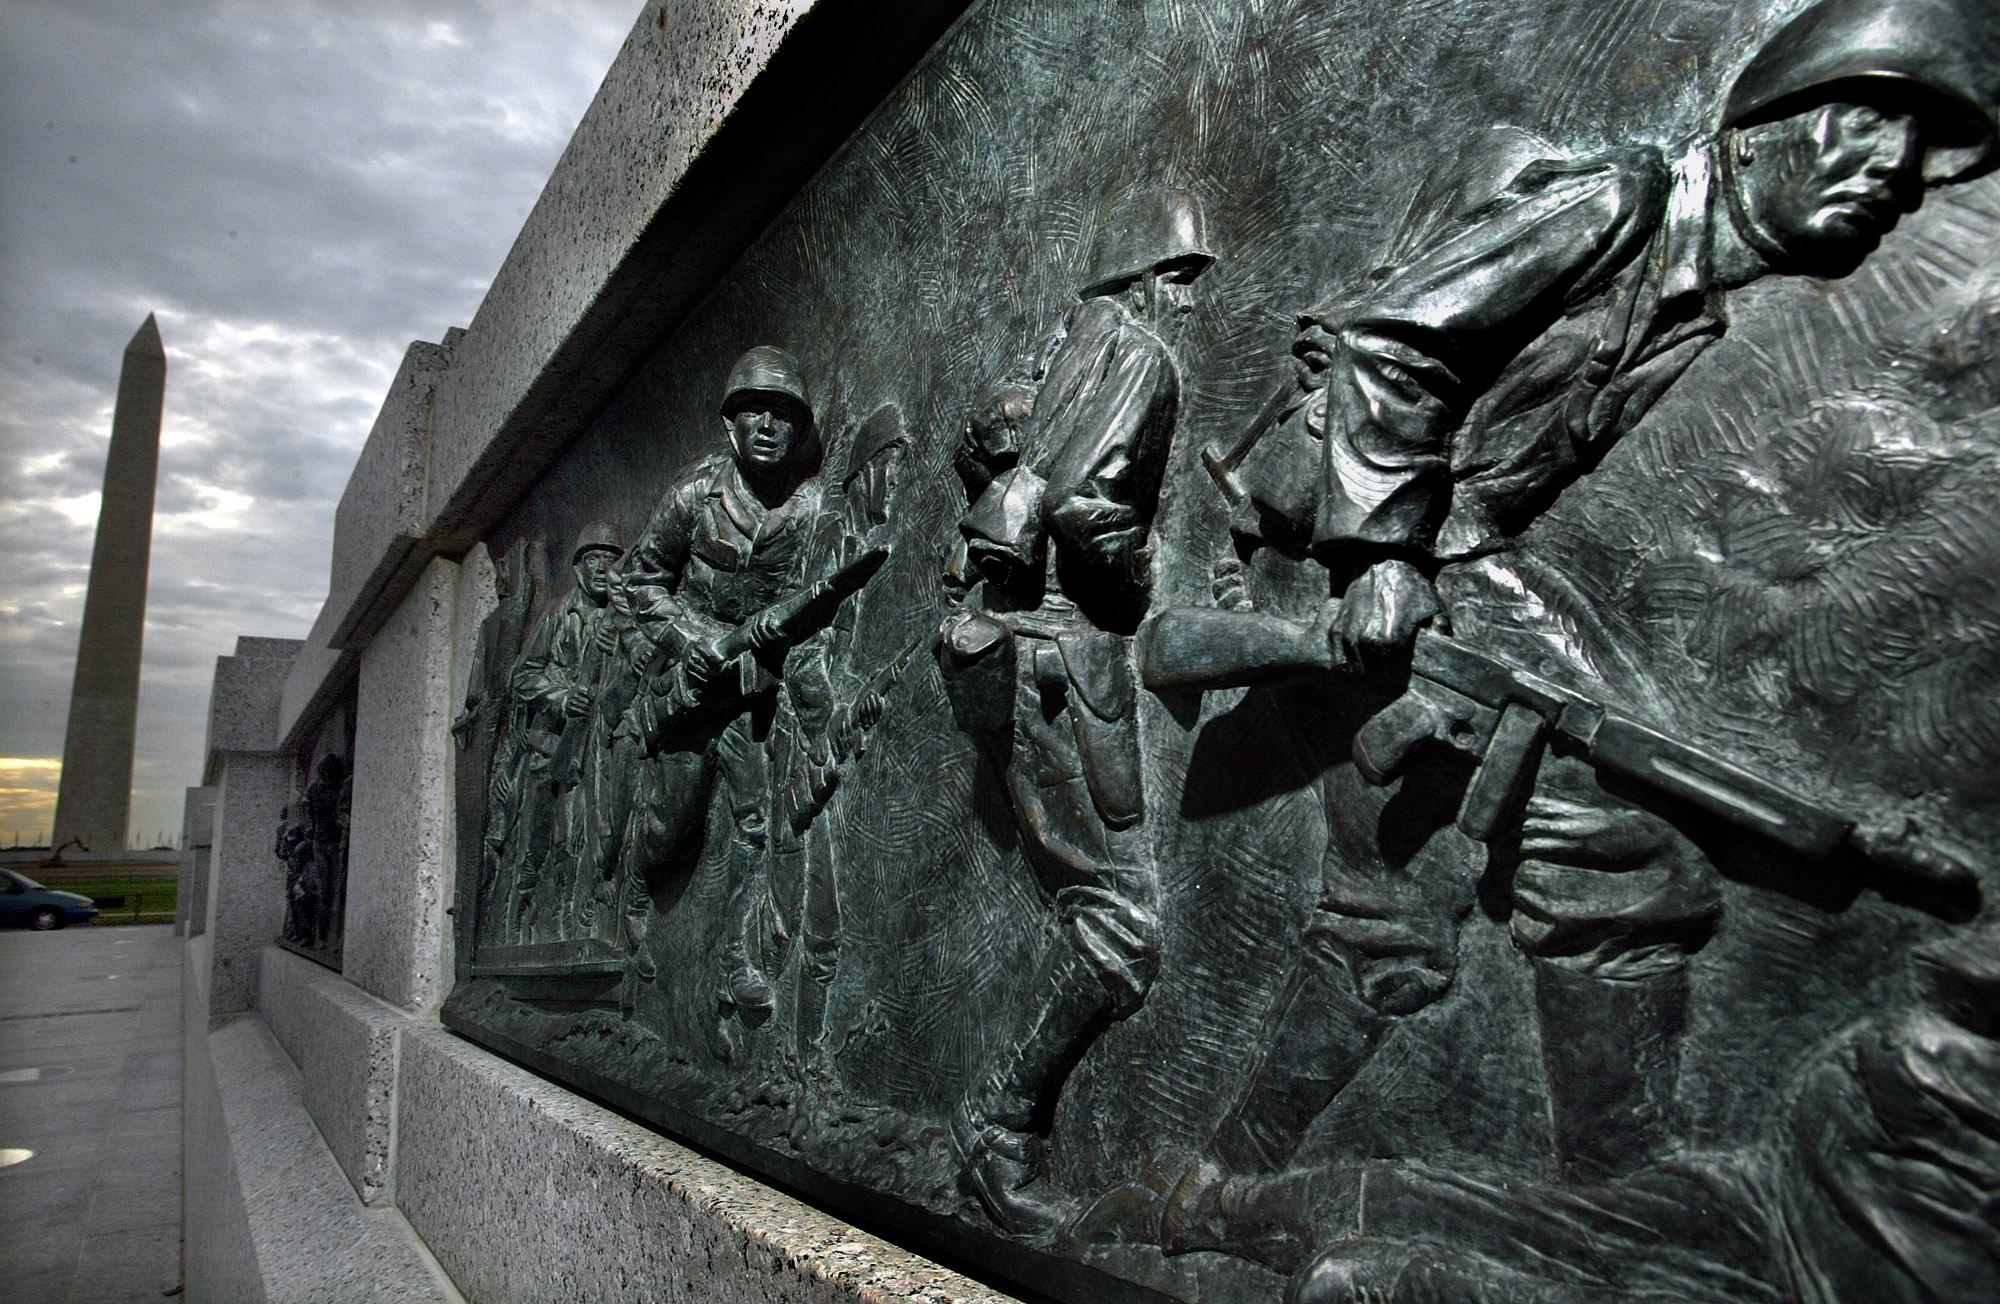 Bas-relief panel showing men in helmets holding weapons (© Ron Edmonds/AP Images)